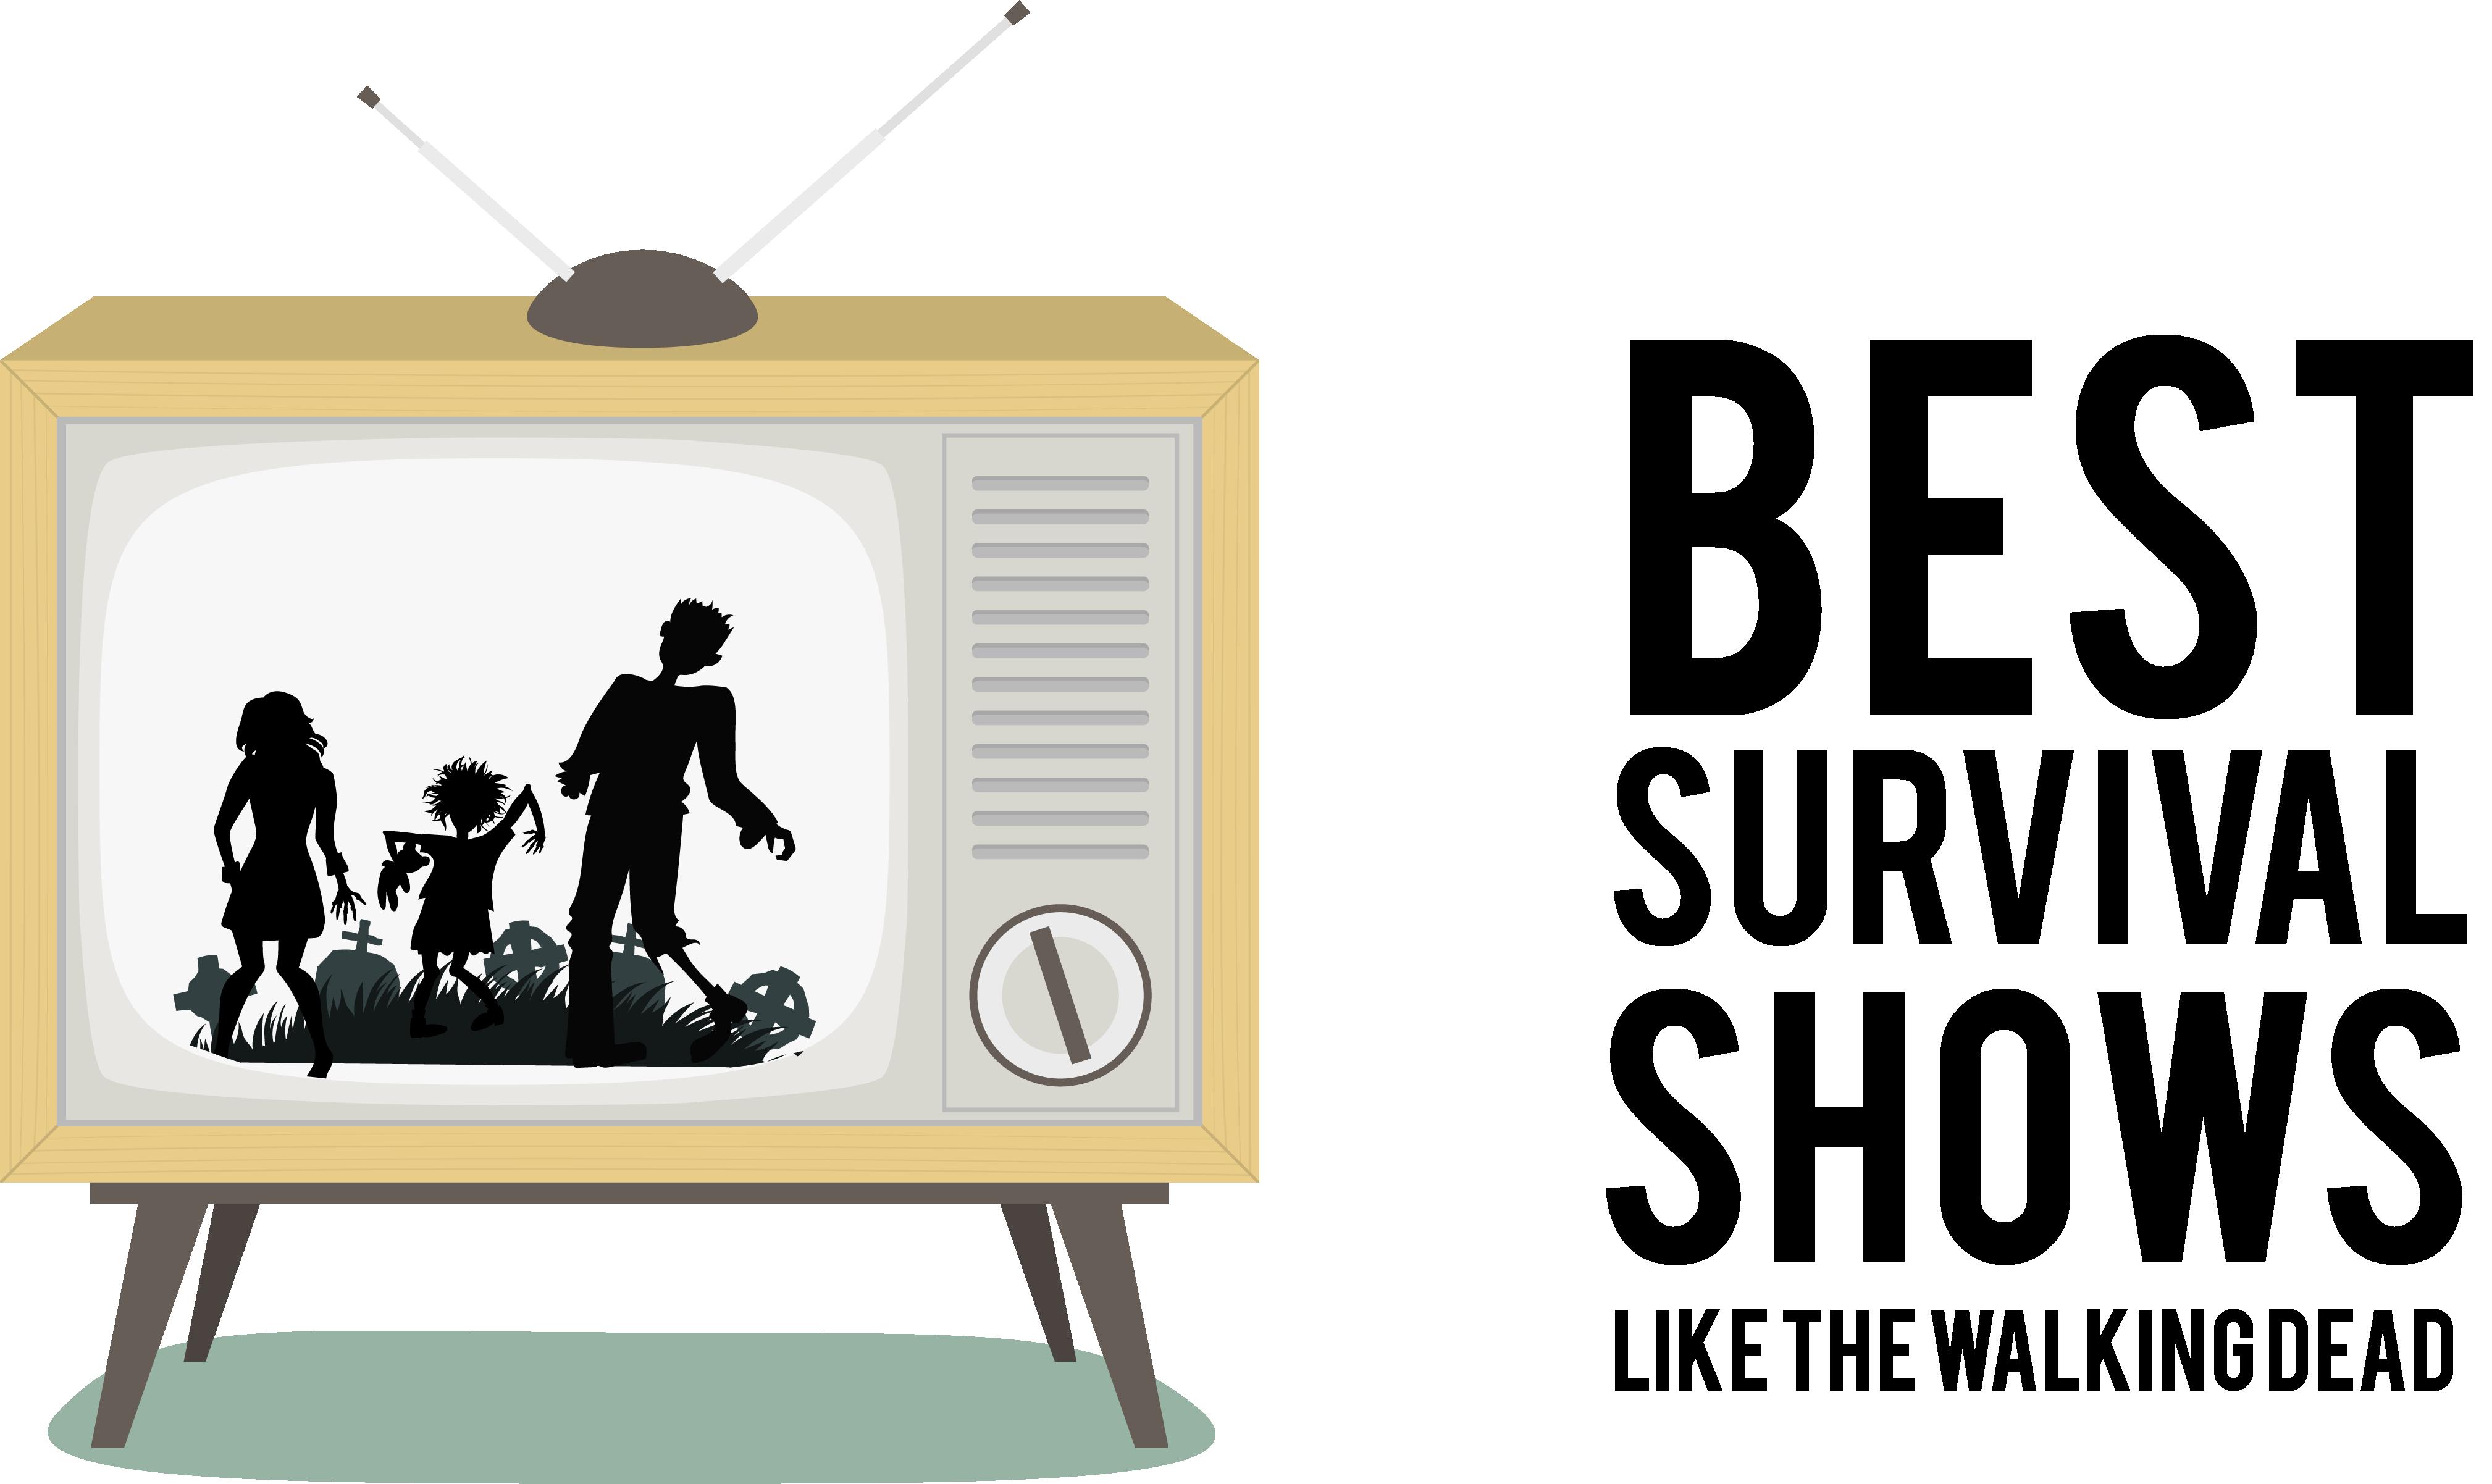 db89fb6e70c9d 10 Best Survival TV Shows [Like The Walking Dead] > Mike's Gear Reviews